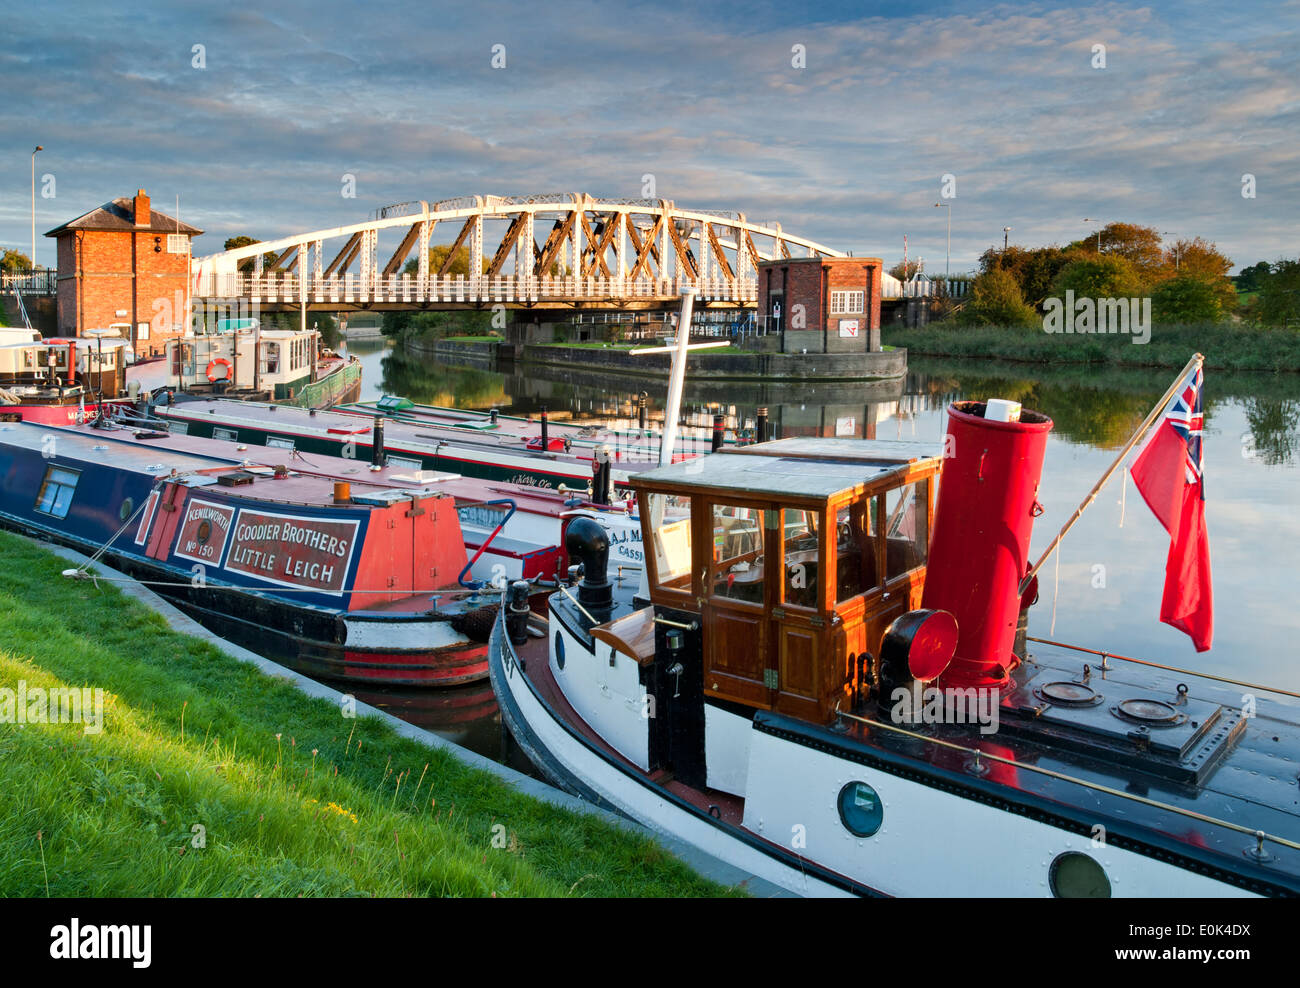 Old Steamboat Moored on the River Weaver Below Acton Bridge, Acton Bridge, Cheshire, England, UK - Stock Image